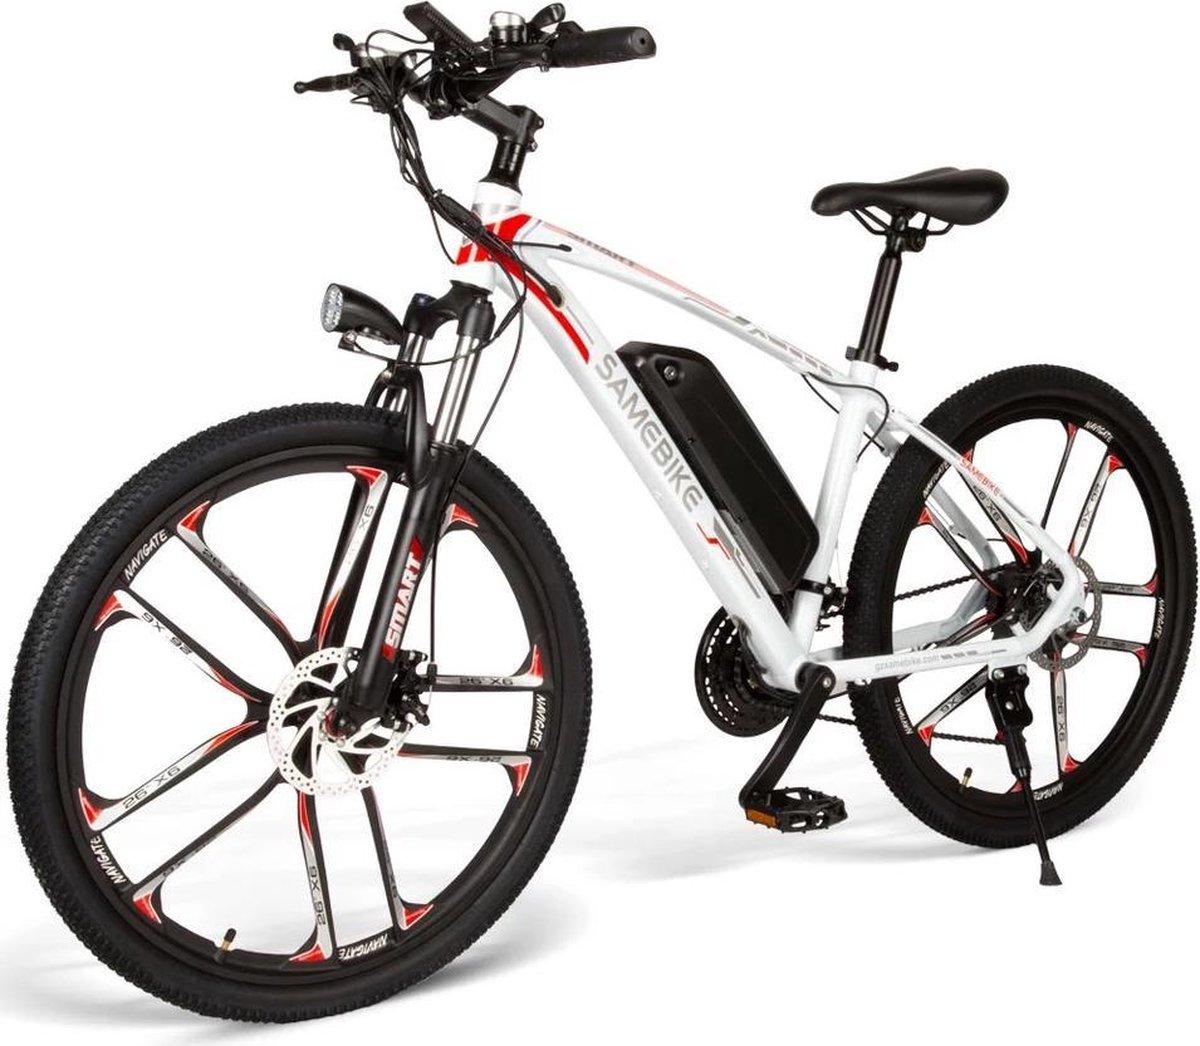 Matrix E bike -Samebike MY-SM26 Edition White - Elektrische - 48V 8AH - 30 Km/h Top Snelheid met ber